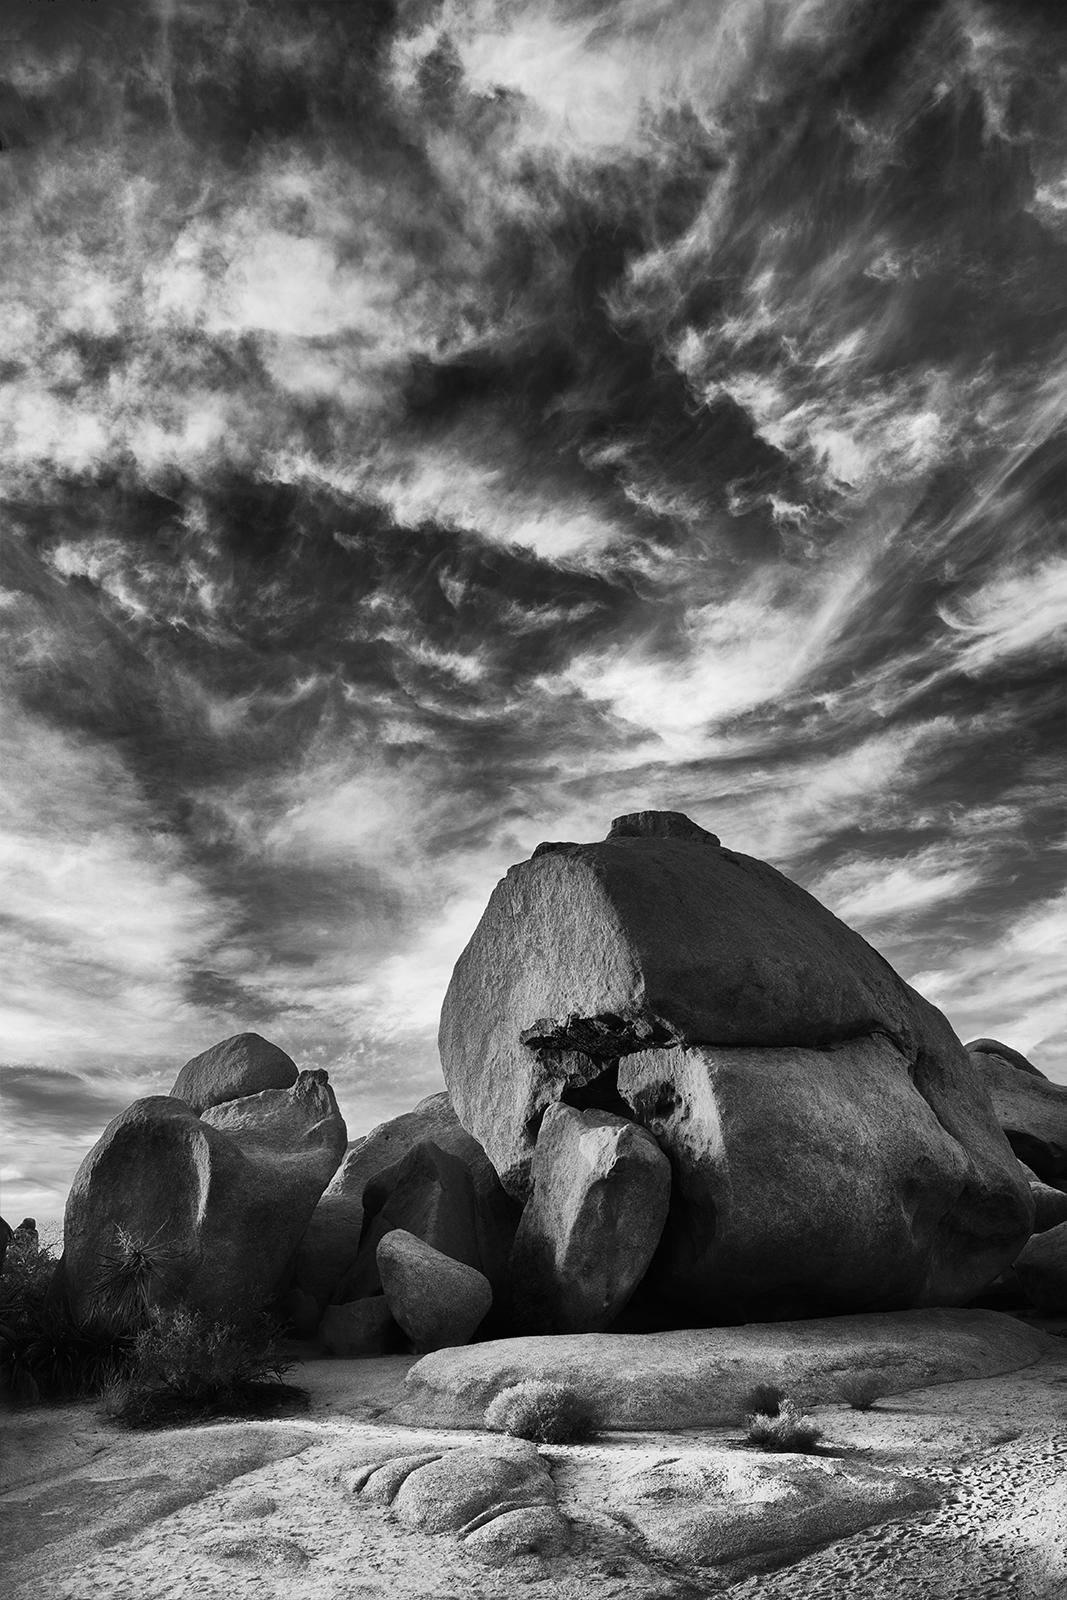 Joshua Tree National Park, Joshua, California, desert, ron, ronald, saunders, photography, best of, landscape, scenic, black, white,  ronald j saunders, National Park, great, landscape, best, outdoor, photo